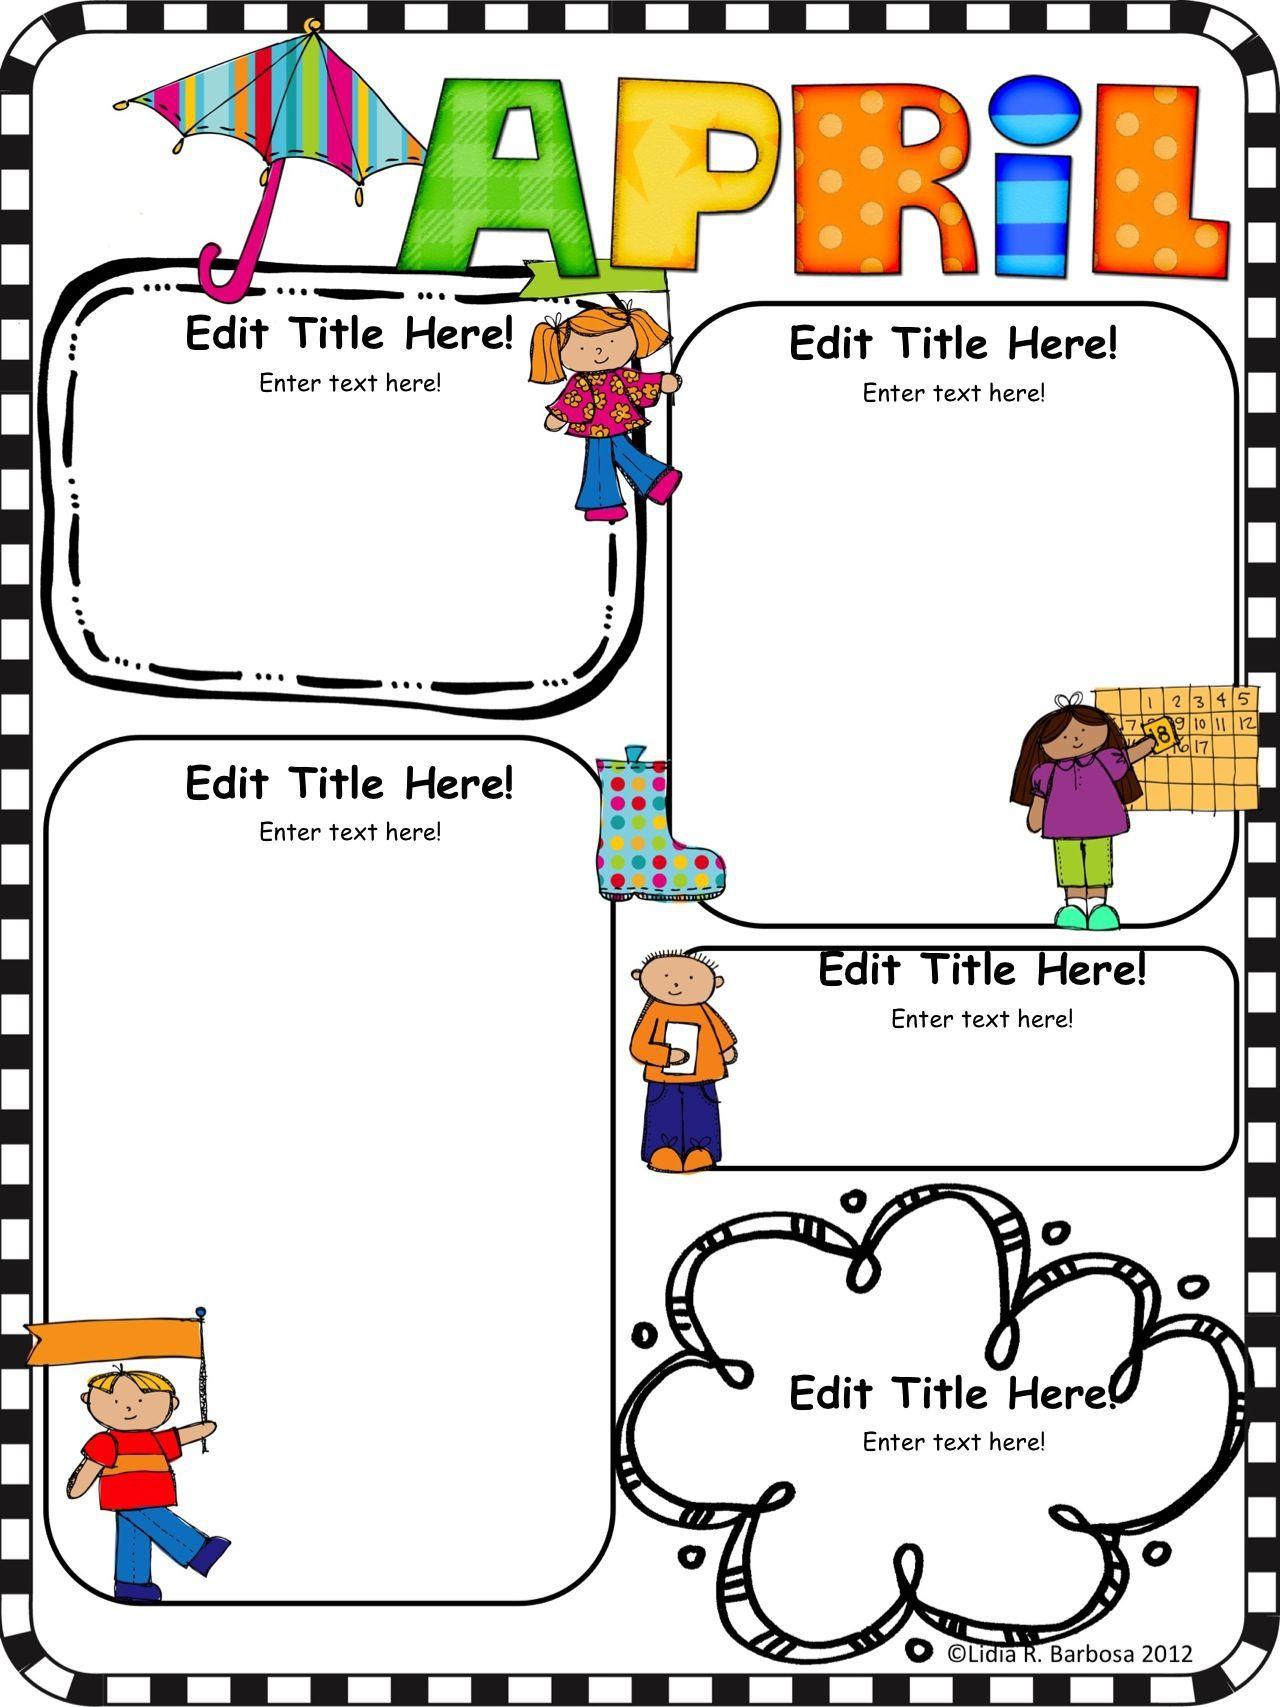 001 Singular Free Editable Daycare Newsletter Template For Word Design  ClassroomFull